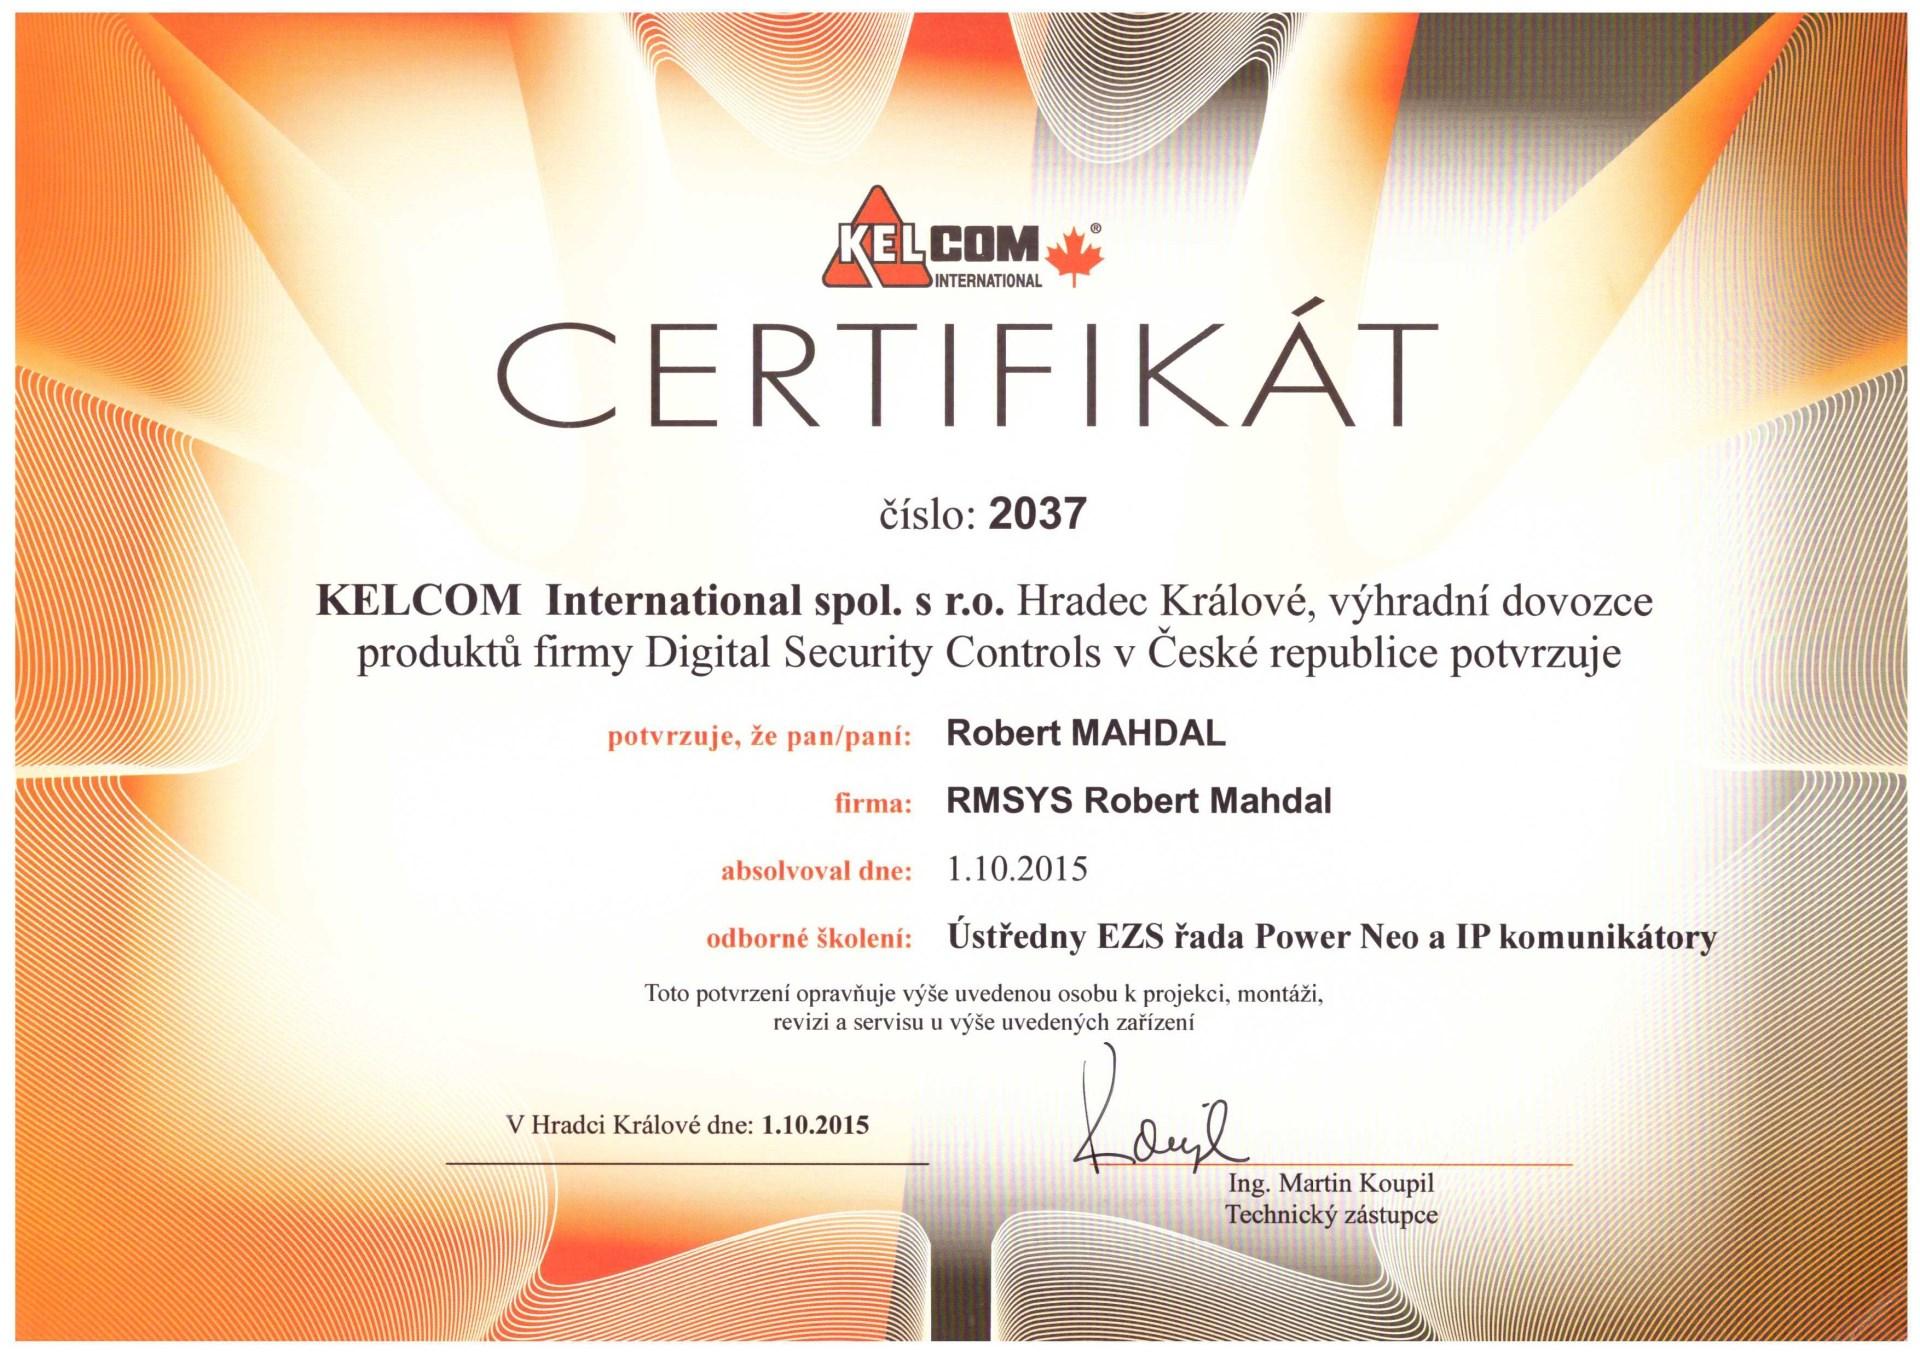 certifikát Kelcom